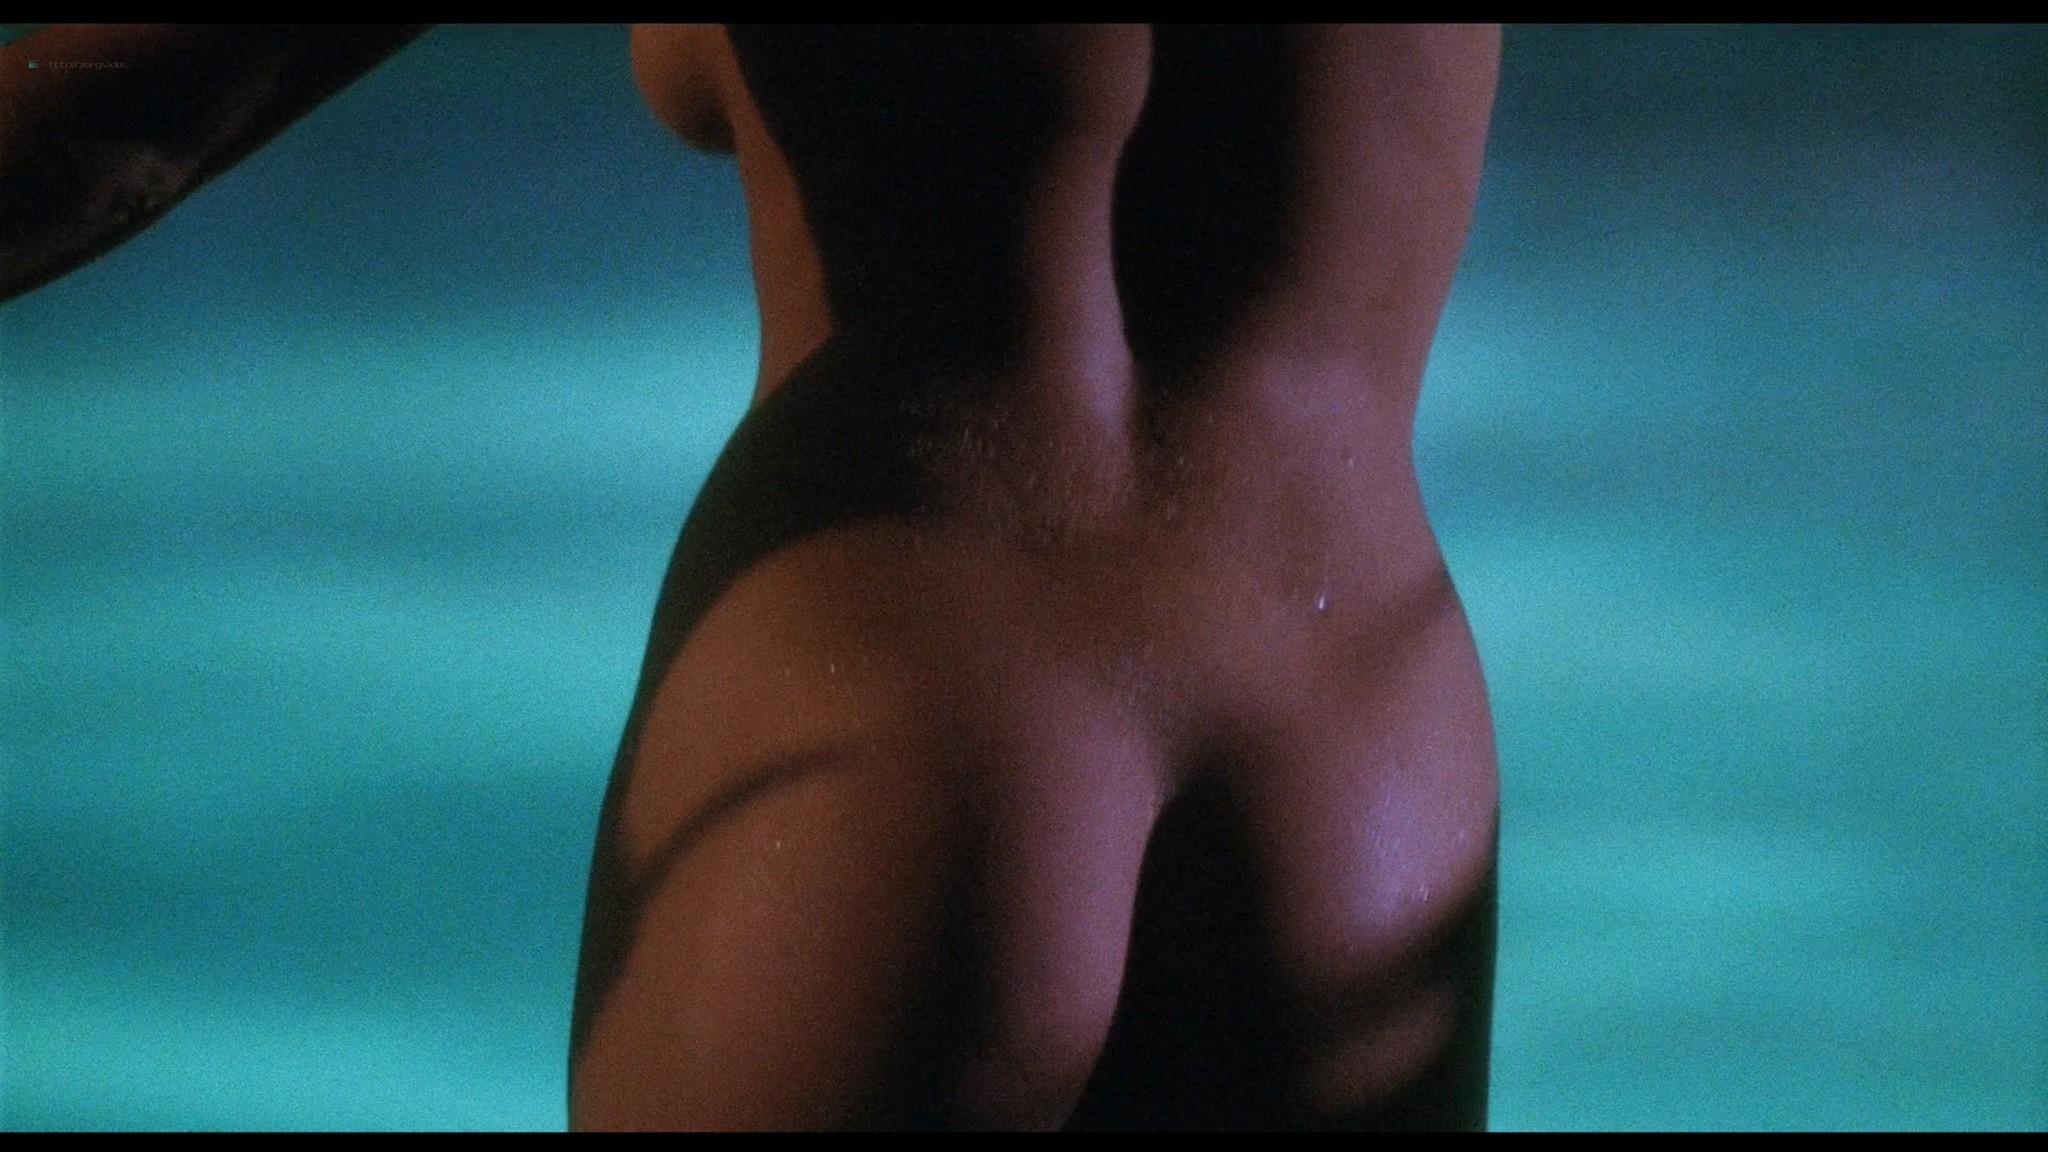 Bridget Fonda nude butt boobs Britt Ekland nude Joanne Whalley hot - Scandal (1989) HD 1080p BluRay (6)